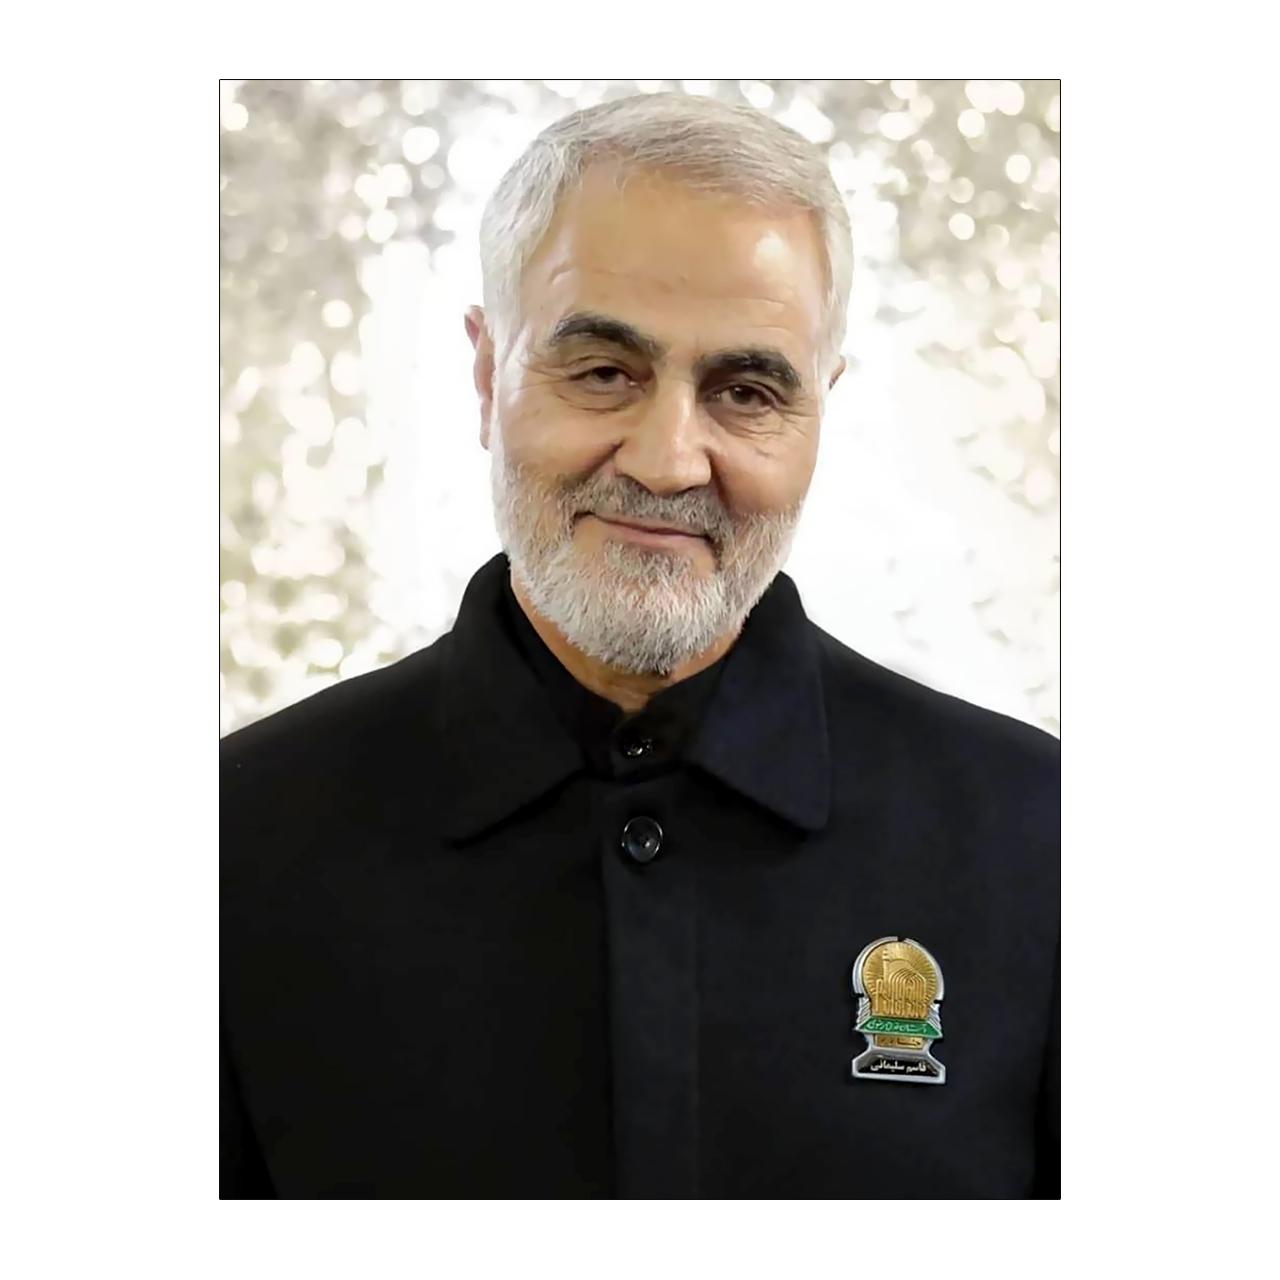 تابلو شاسی طرح شهید حاج قاسم سلیمانی مدل GS-1001